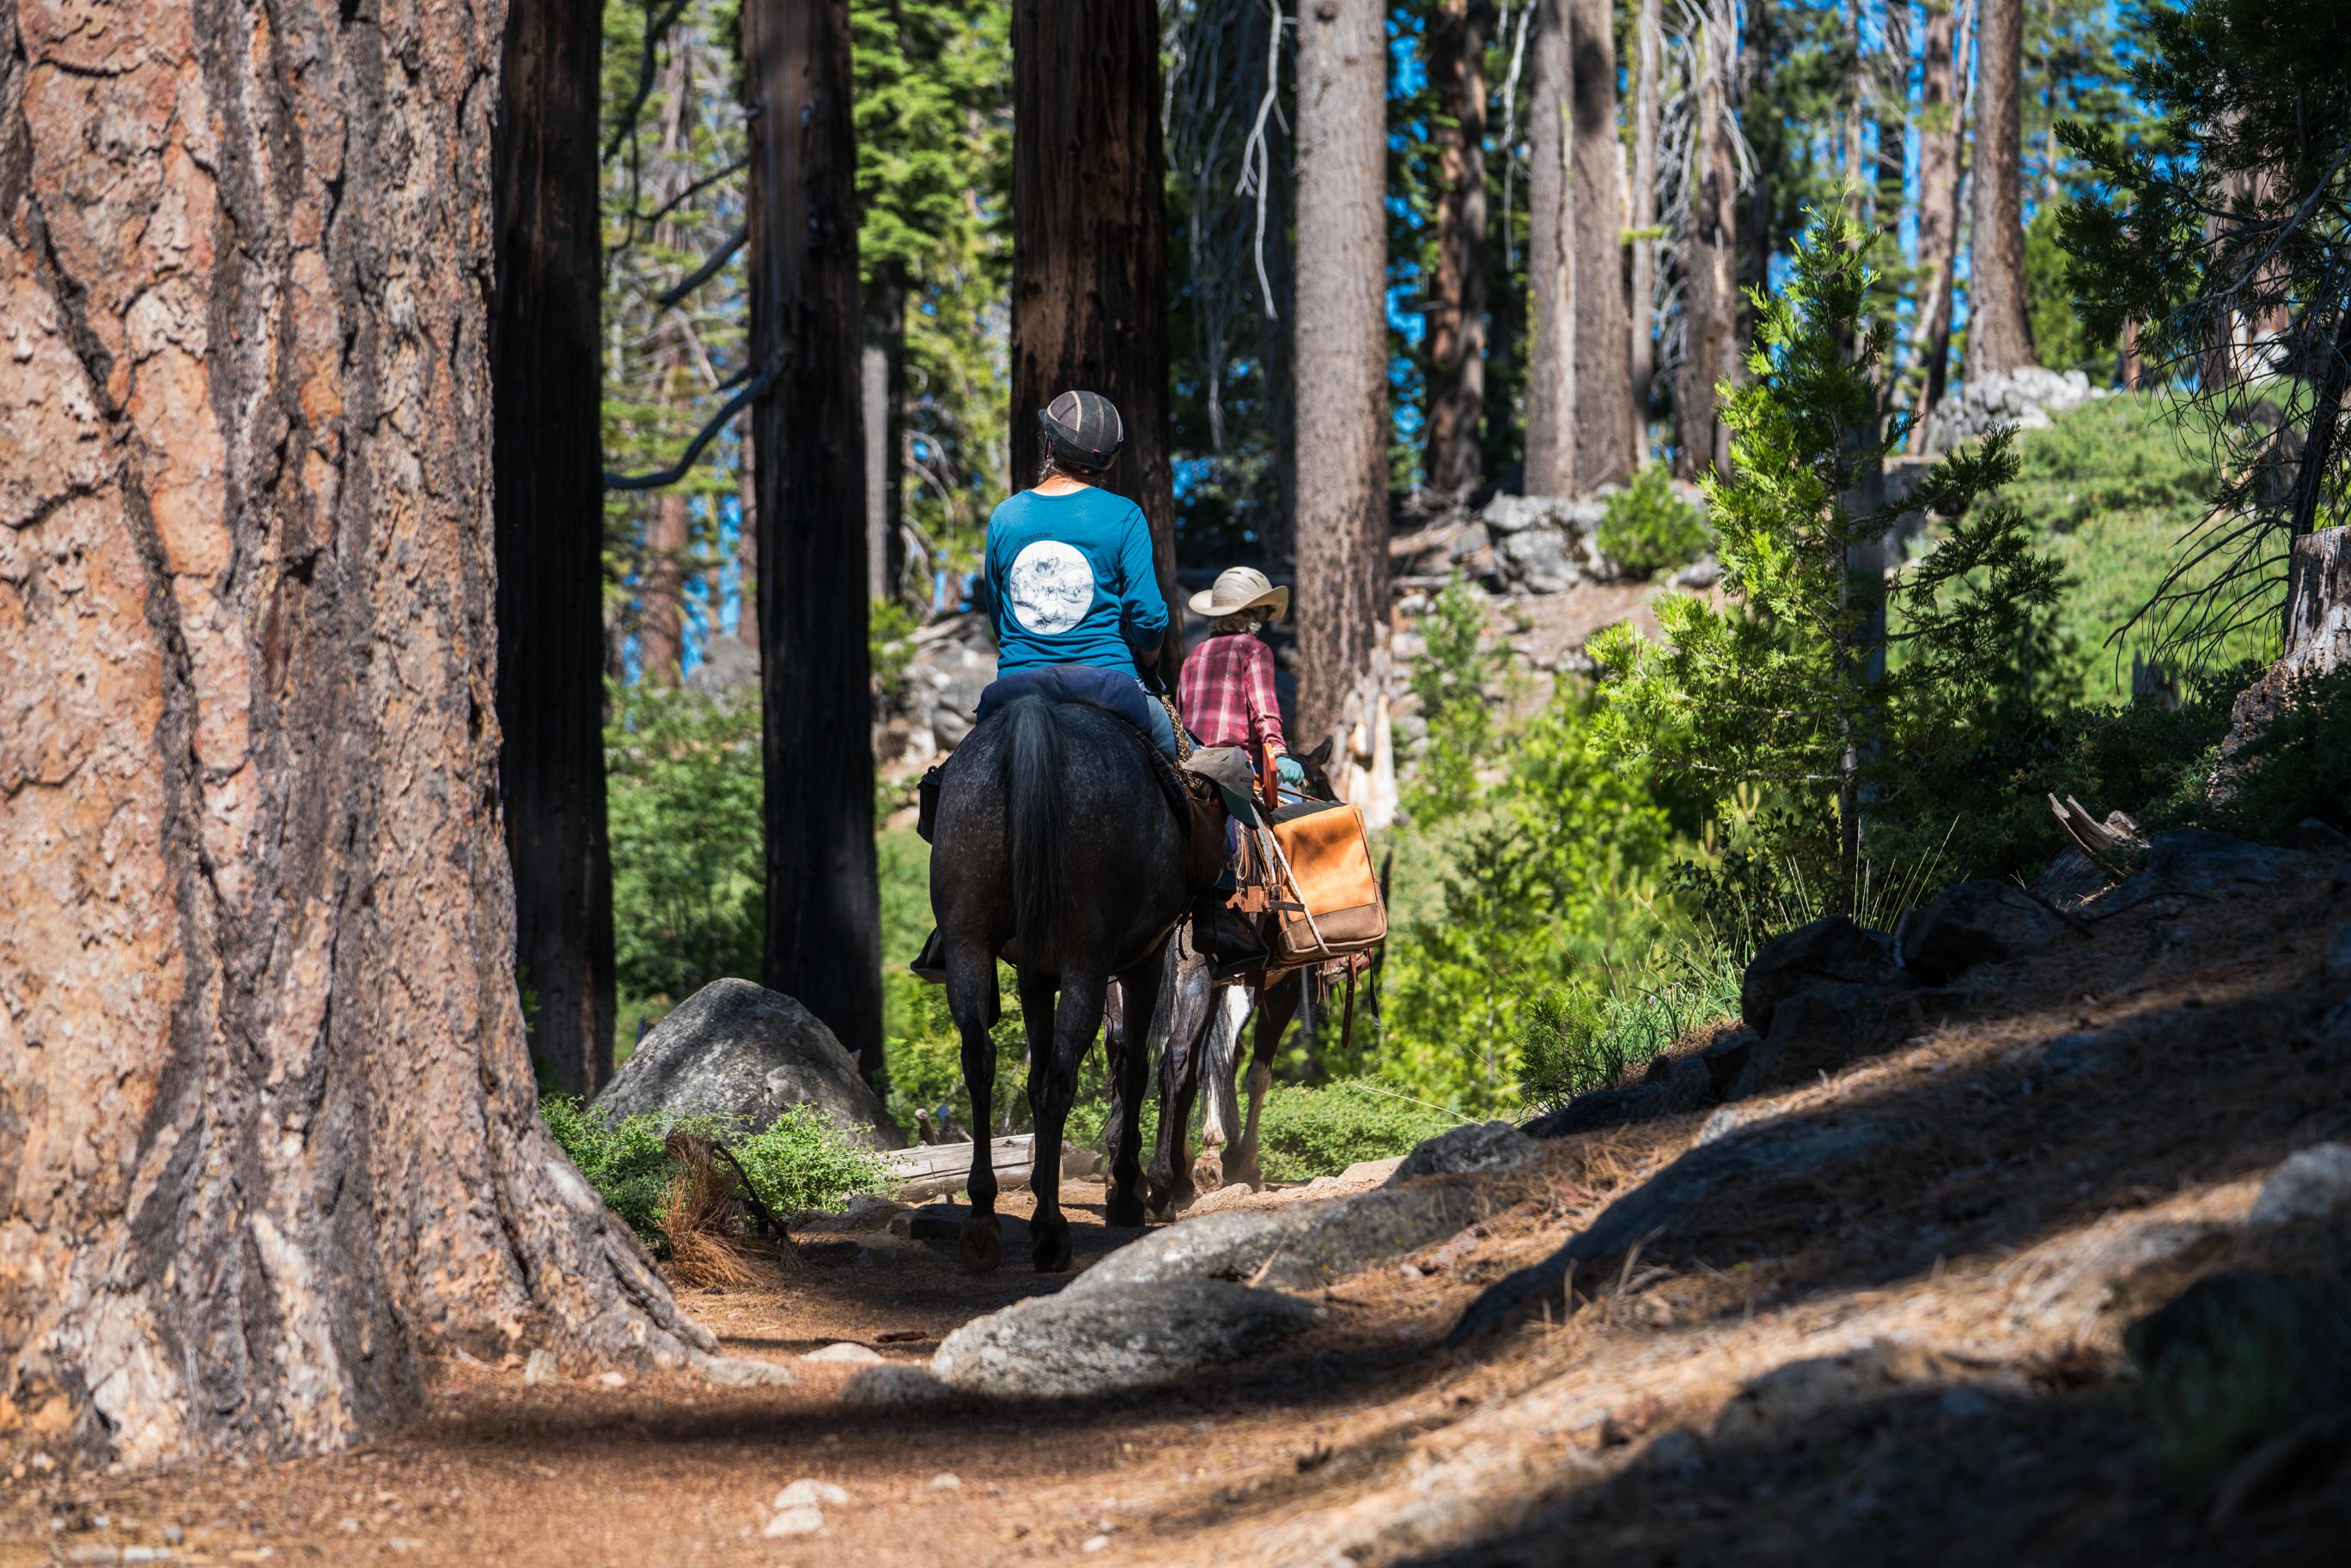 Mariposa Grove, Giant Sequoias, Hiking, Yosemite National Park, Horse Riding, Trail Riding